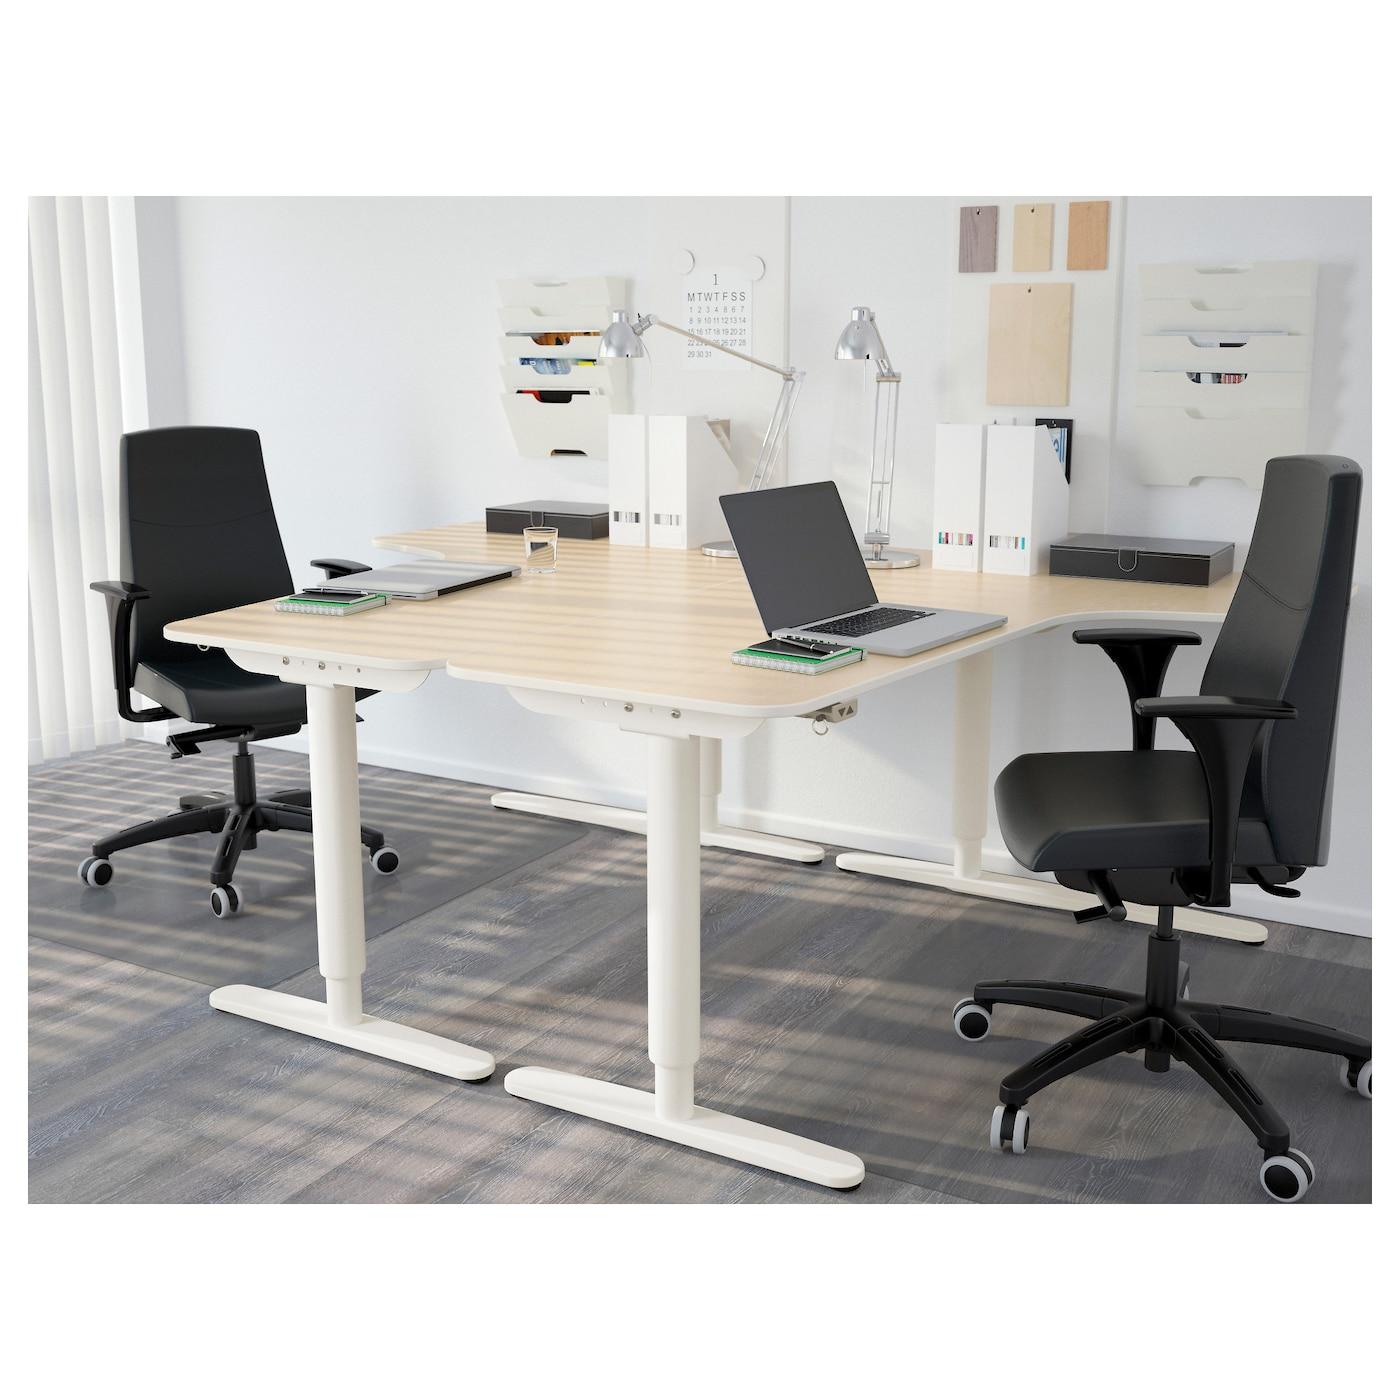 Bekant corner desk right sit stand birch veneer white 160x110 cm ikea - Ikea corner office desk ...